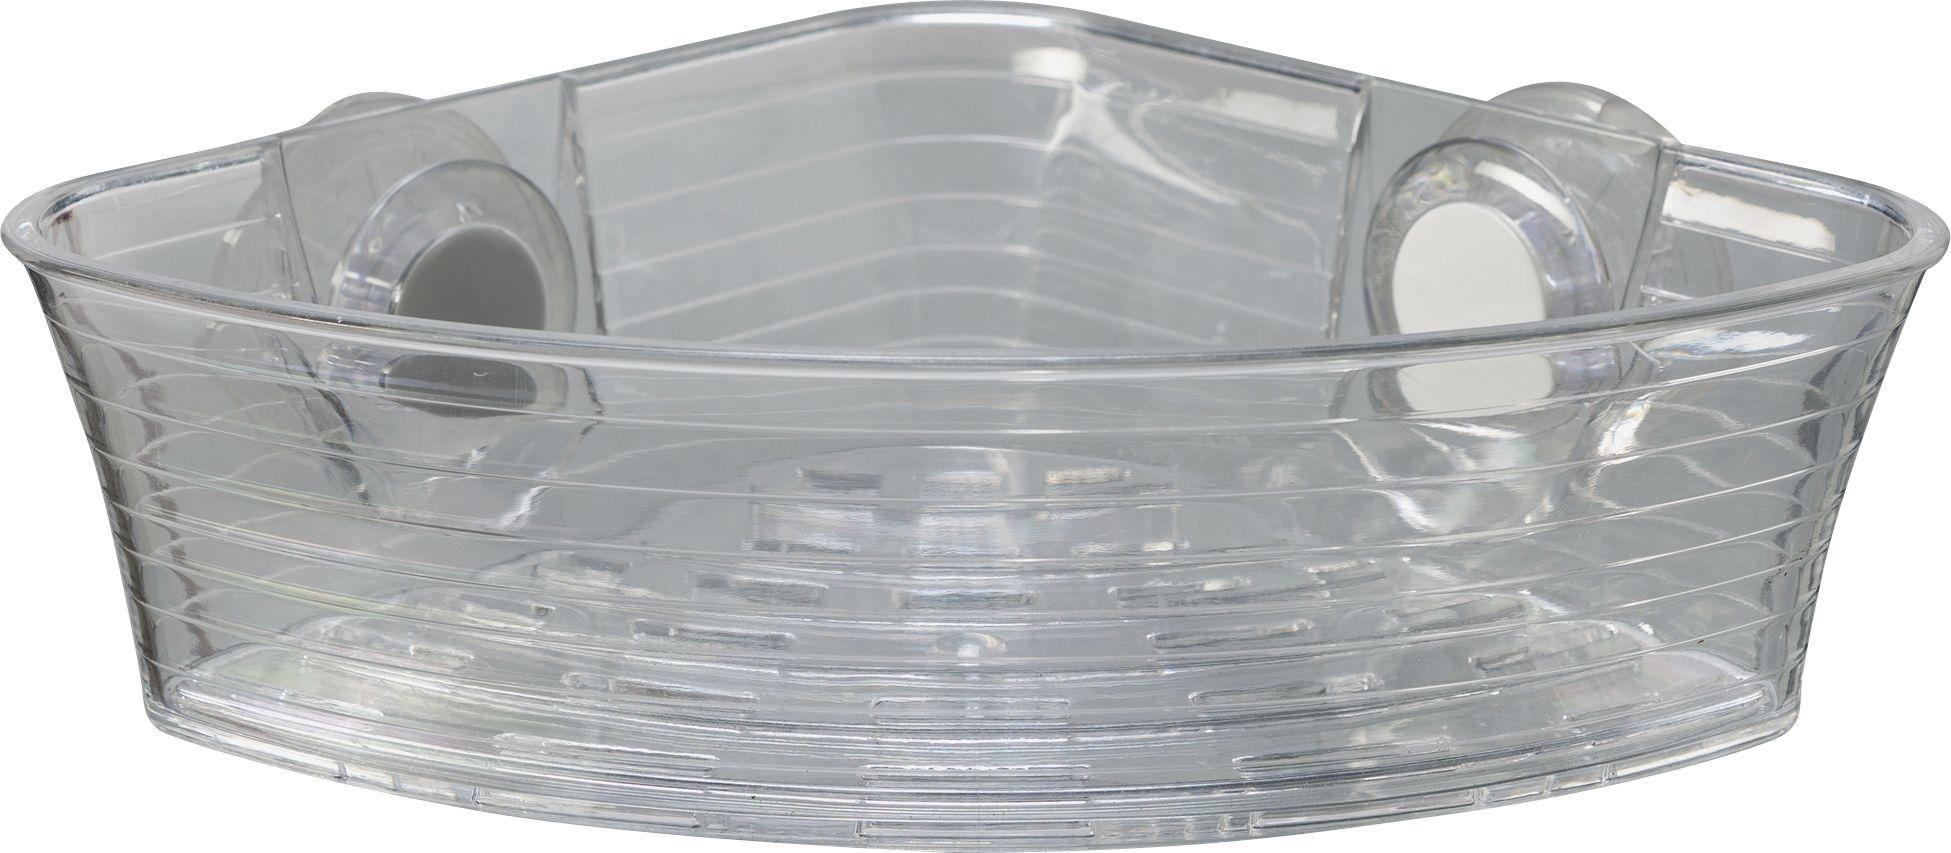 Croydex Press 'n' Lock 1.2 Litre Storage Basket - Clear